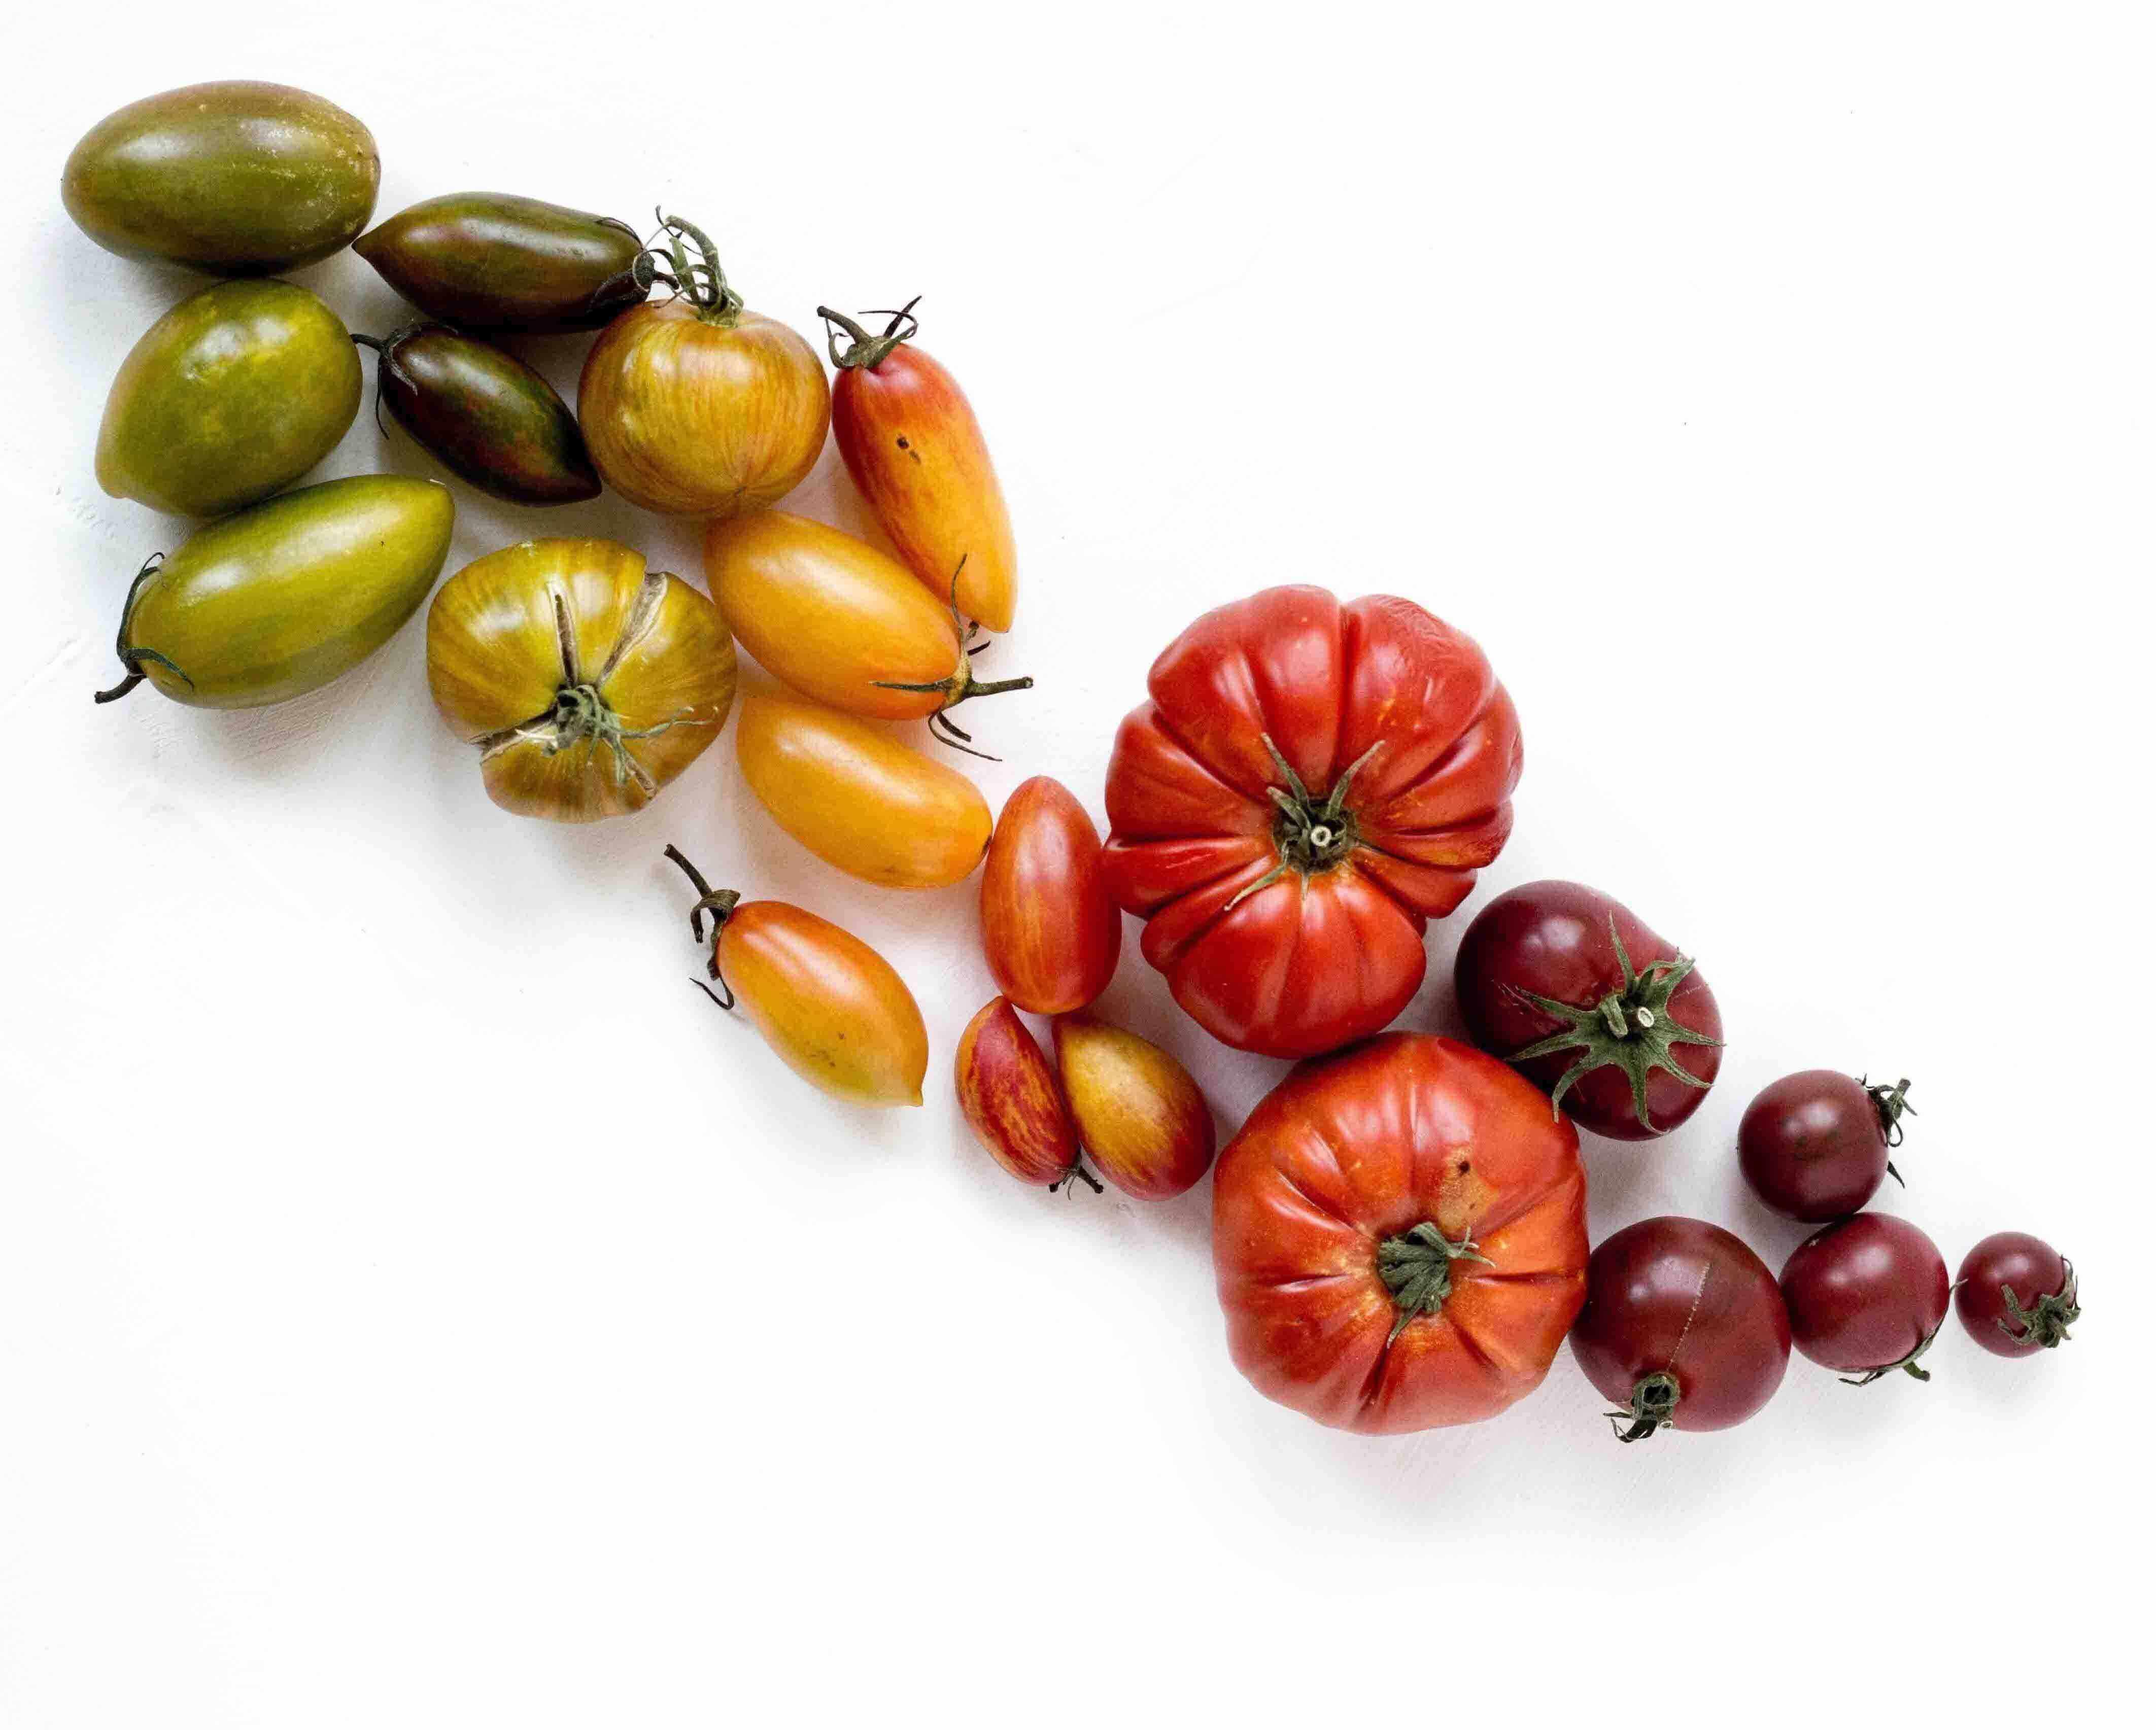 fruits and vegetables fresh in fridge how to keep vegetables fresh longer